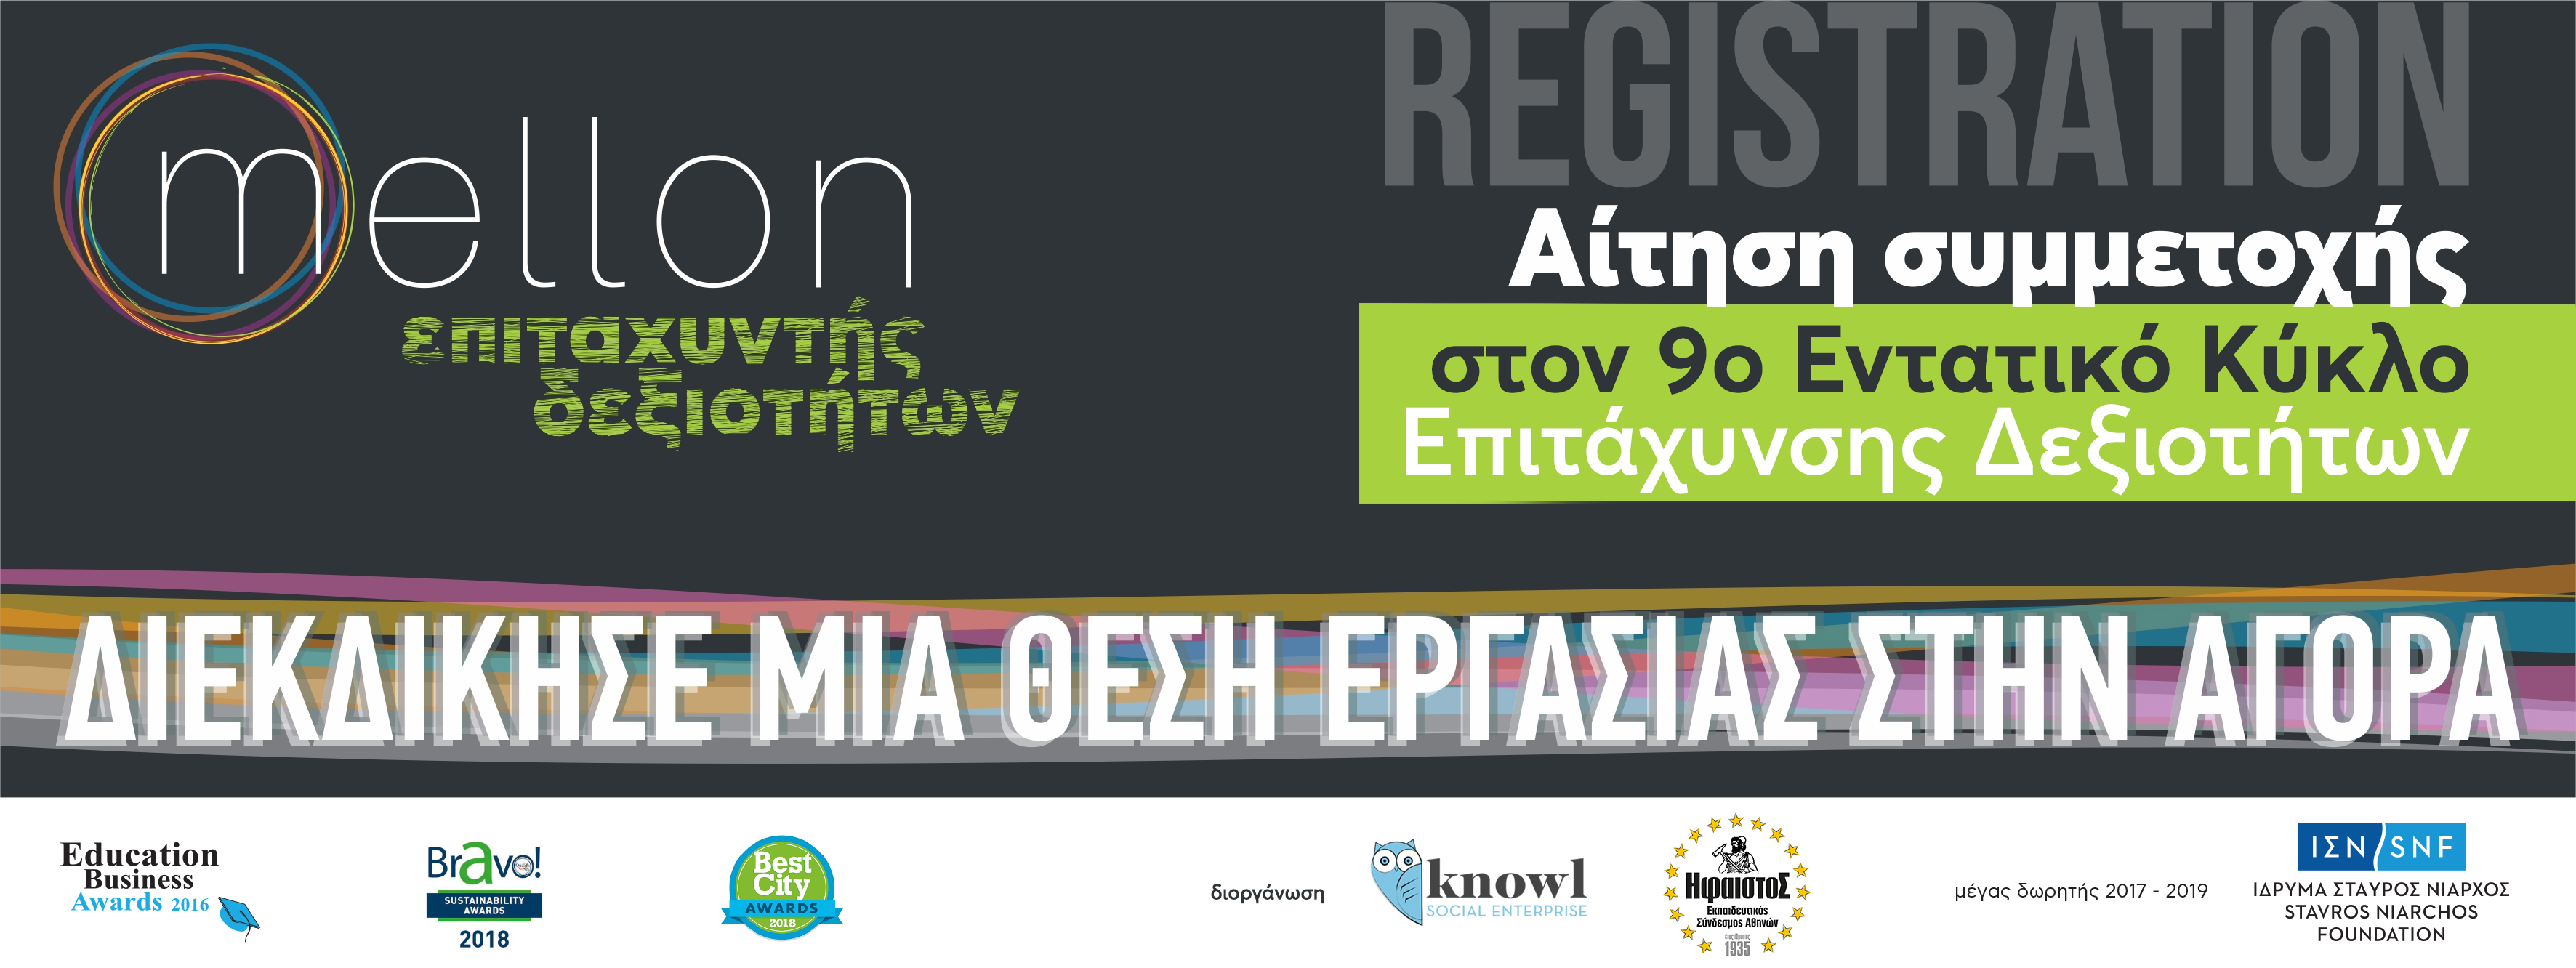 Registration 9oskyklos